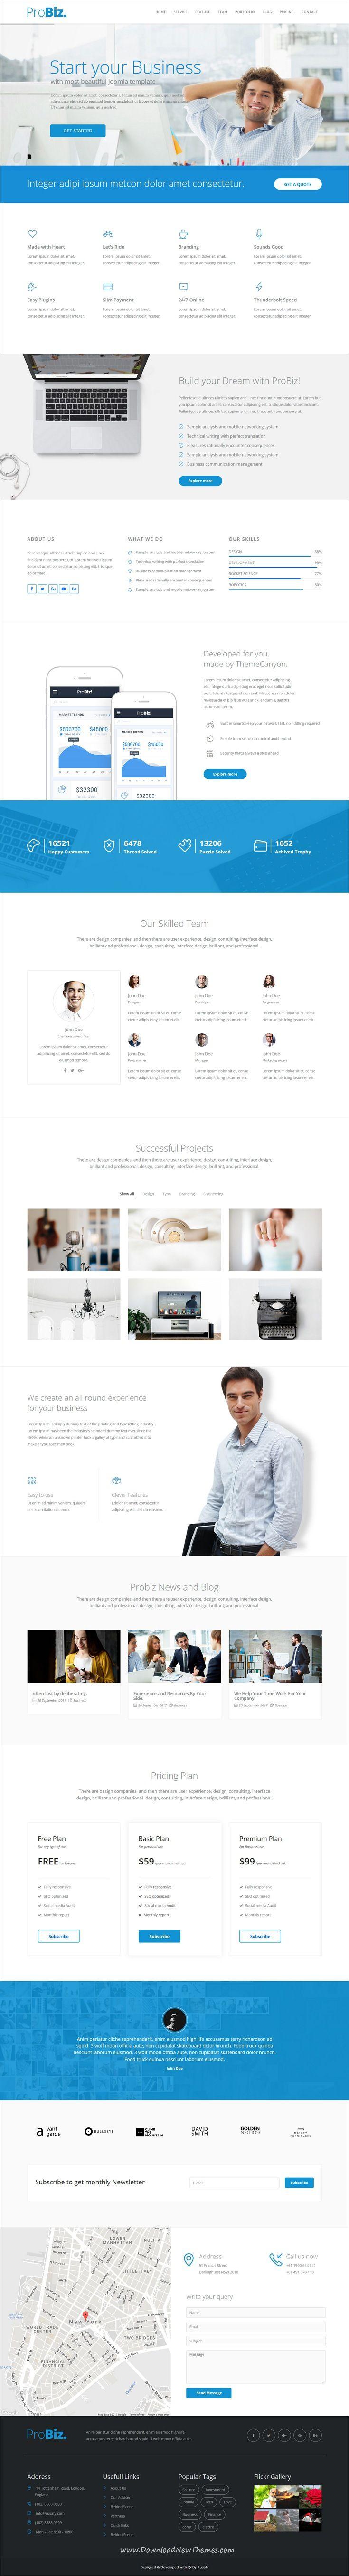 97 best Joomla Hosting images on Pinterest